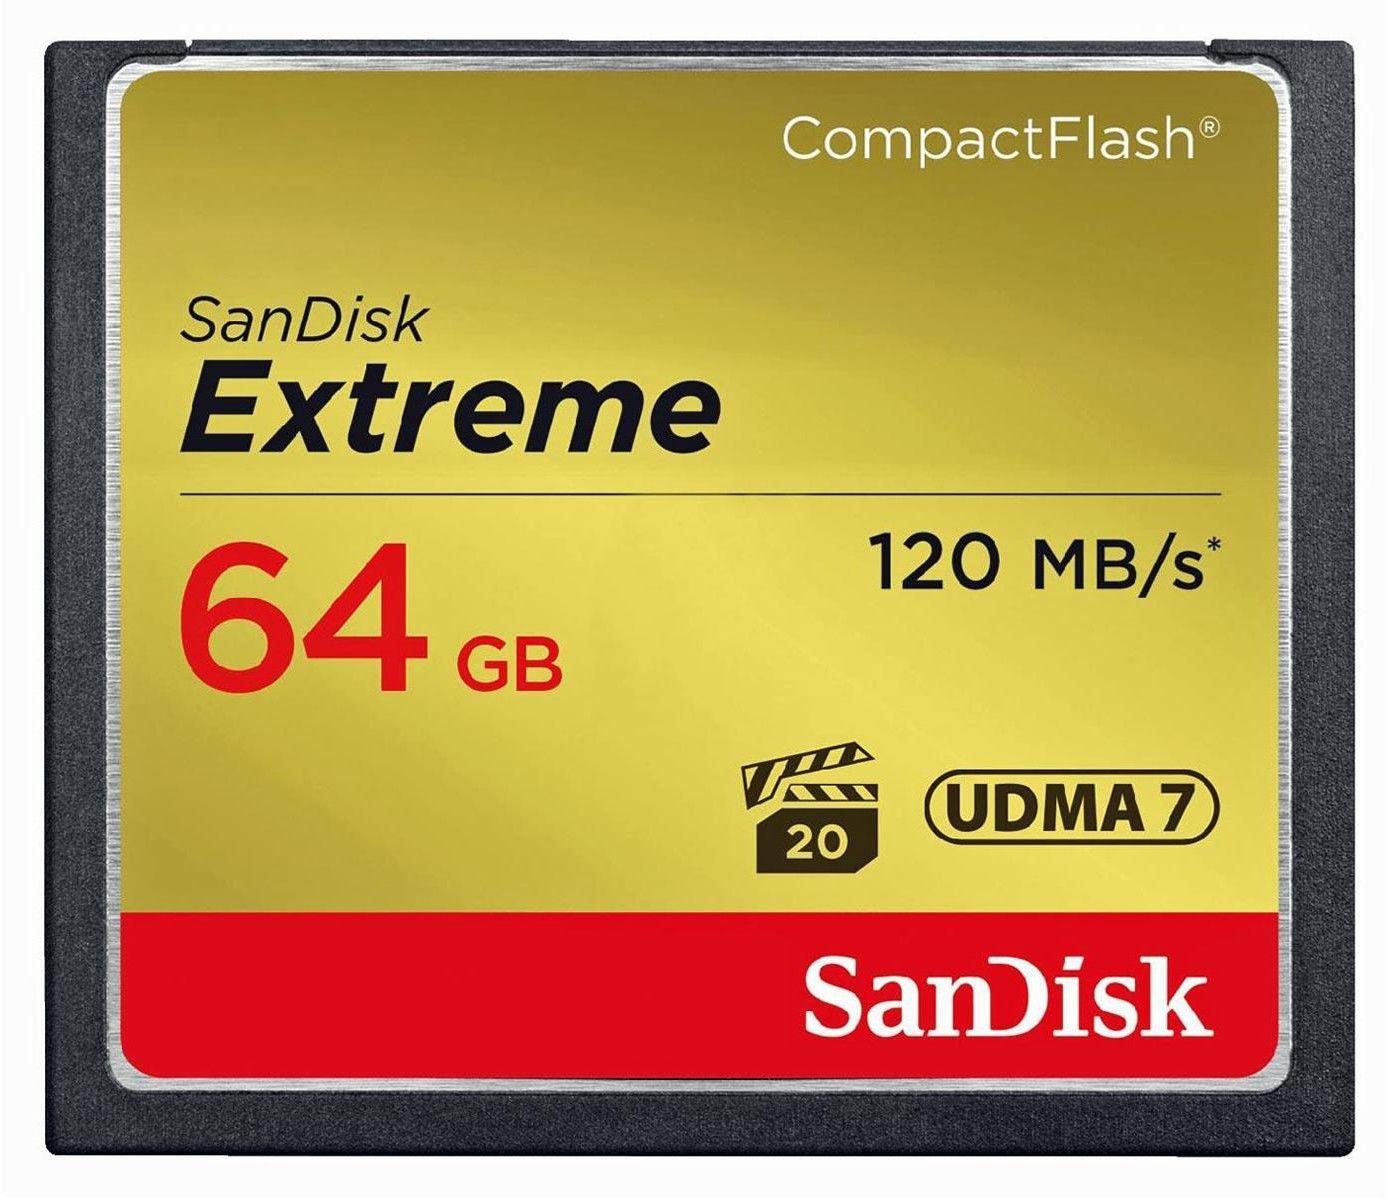 Karta pamięci SanDisk Compact Flash 64 GB Extreme 120 MB/s